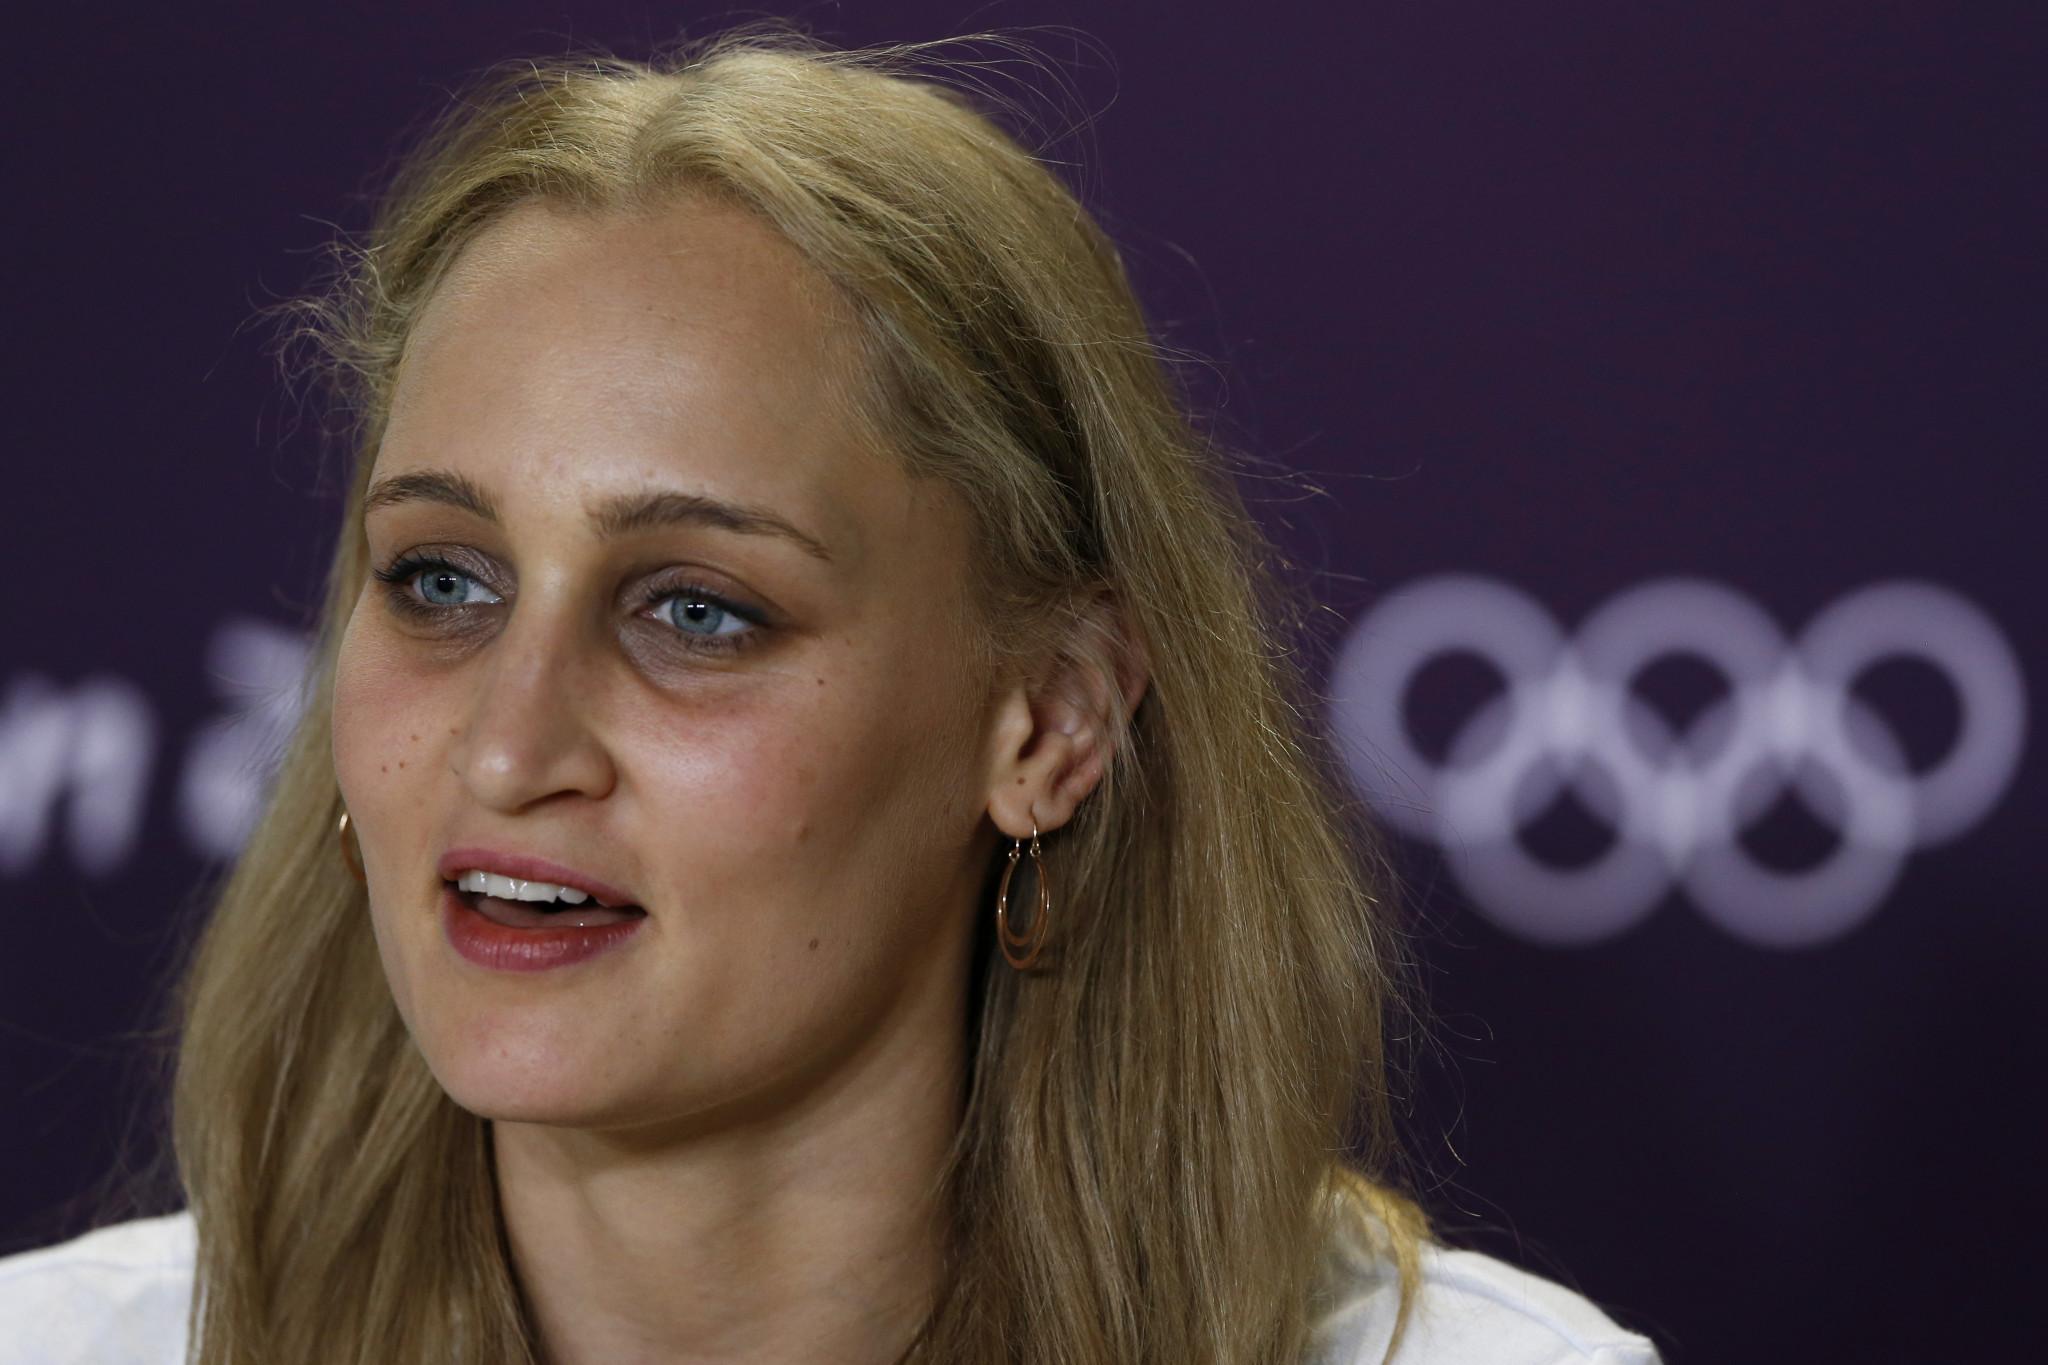 Marton loses appeal against Olympic non-selection for Australian taekwondo team